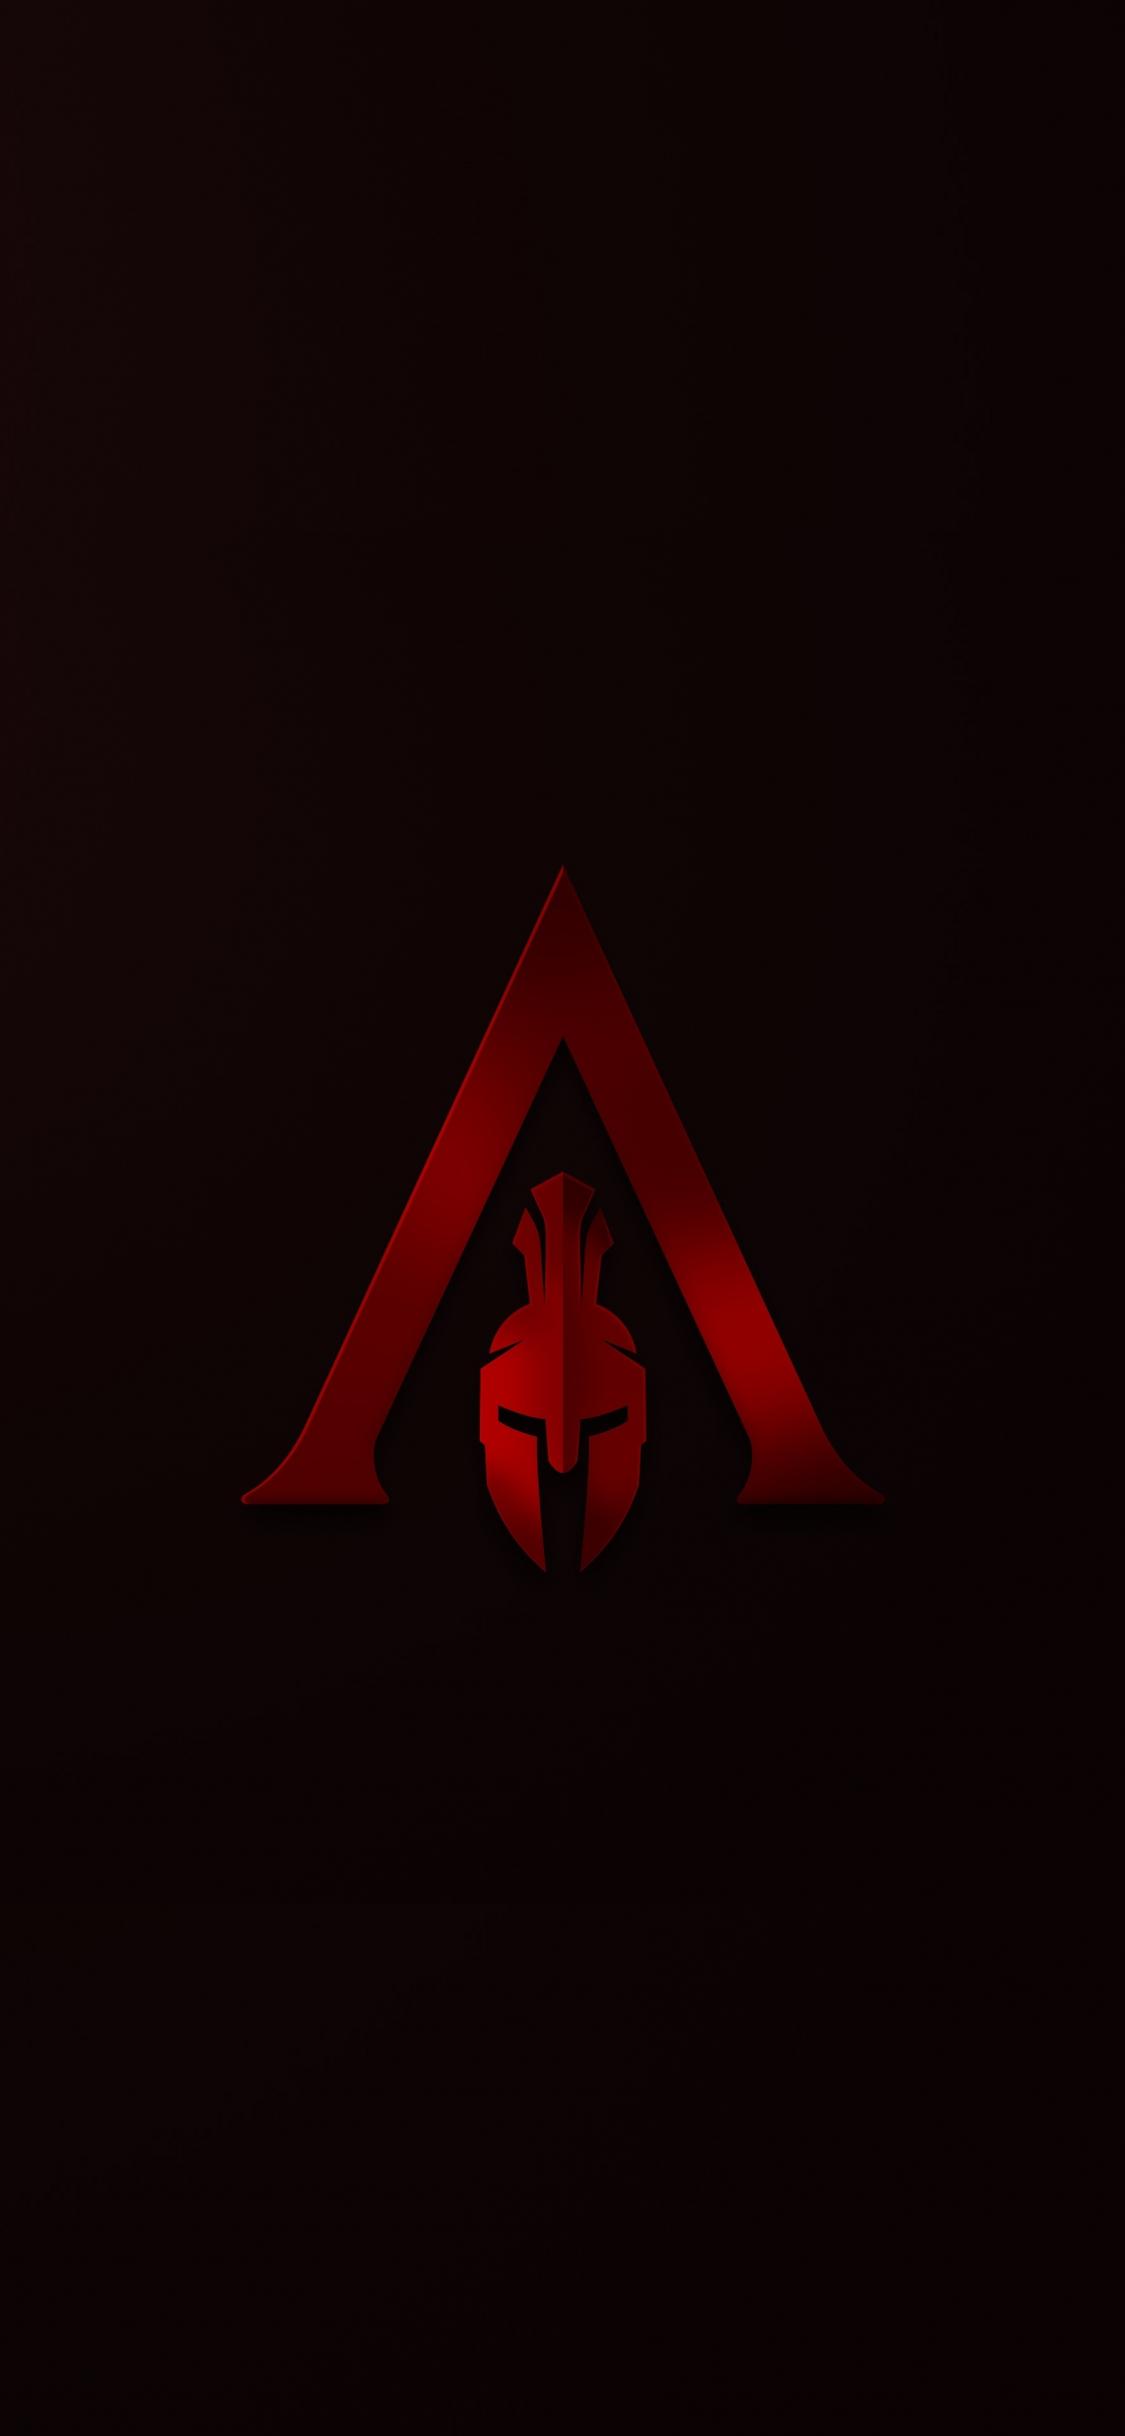 Download 1125x2436 Wallpaper Helmet Minimal Assassin S Creed